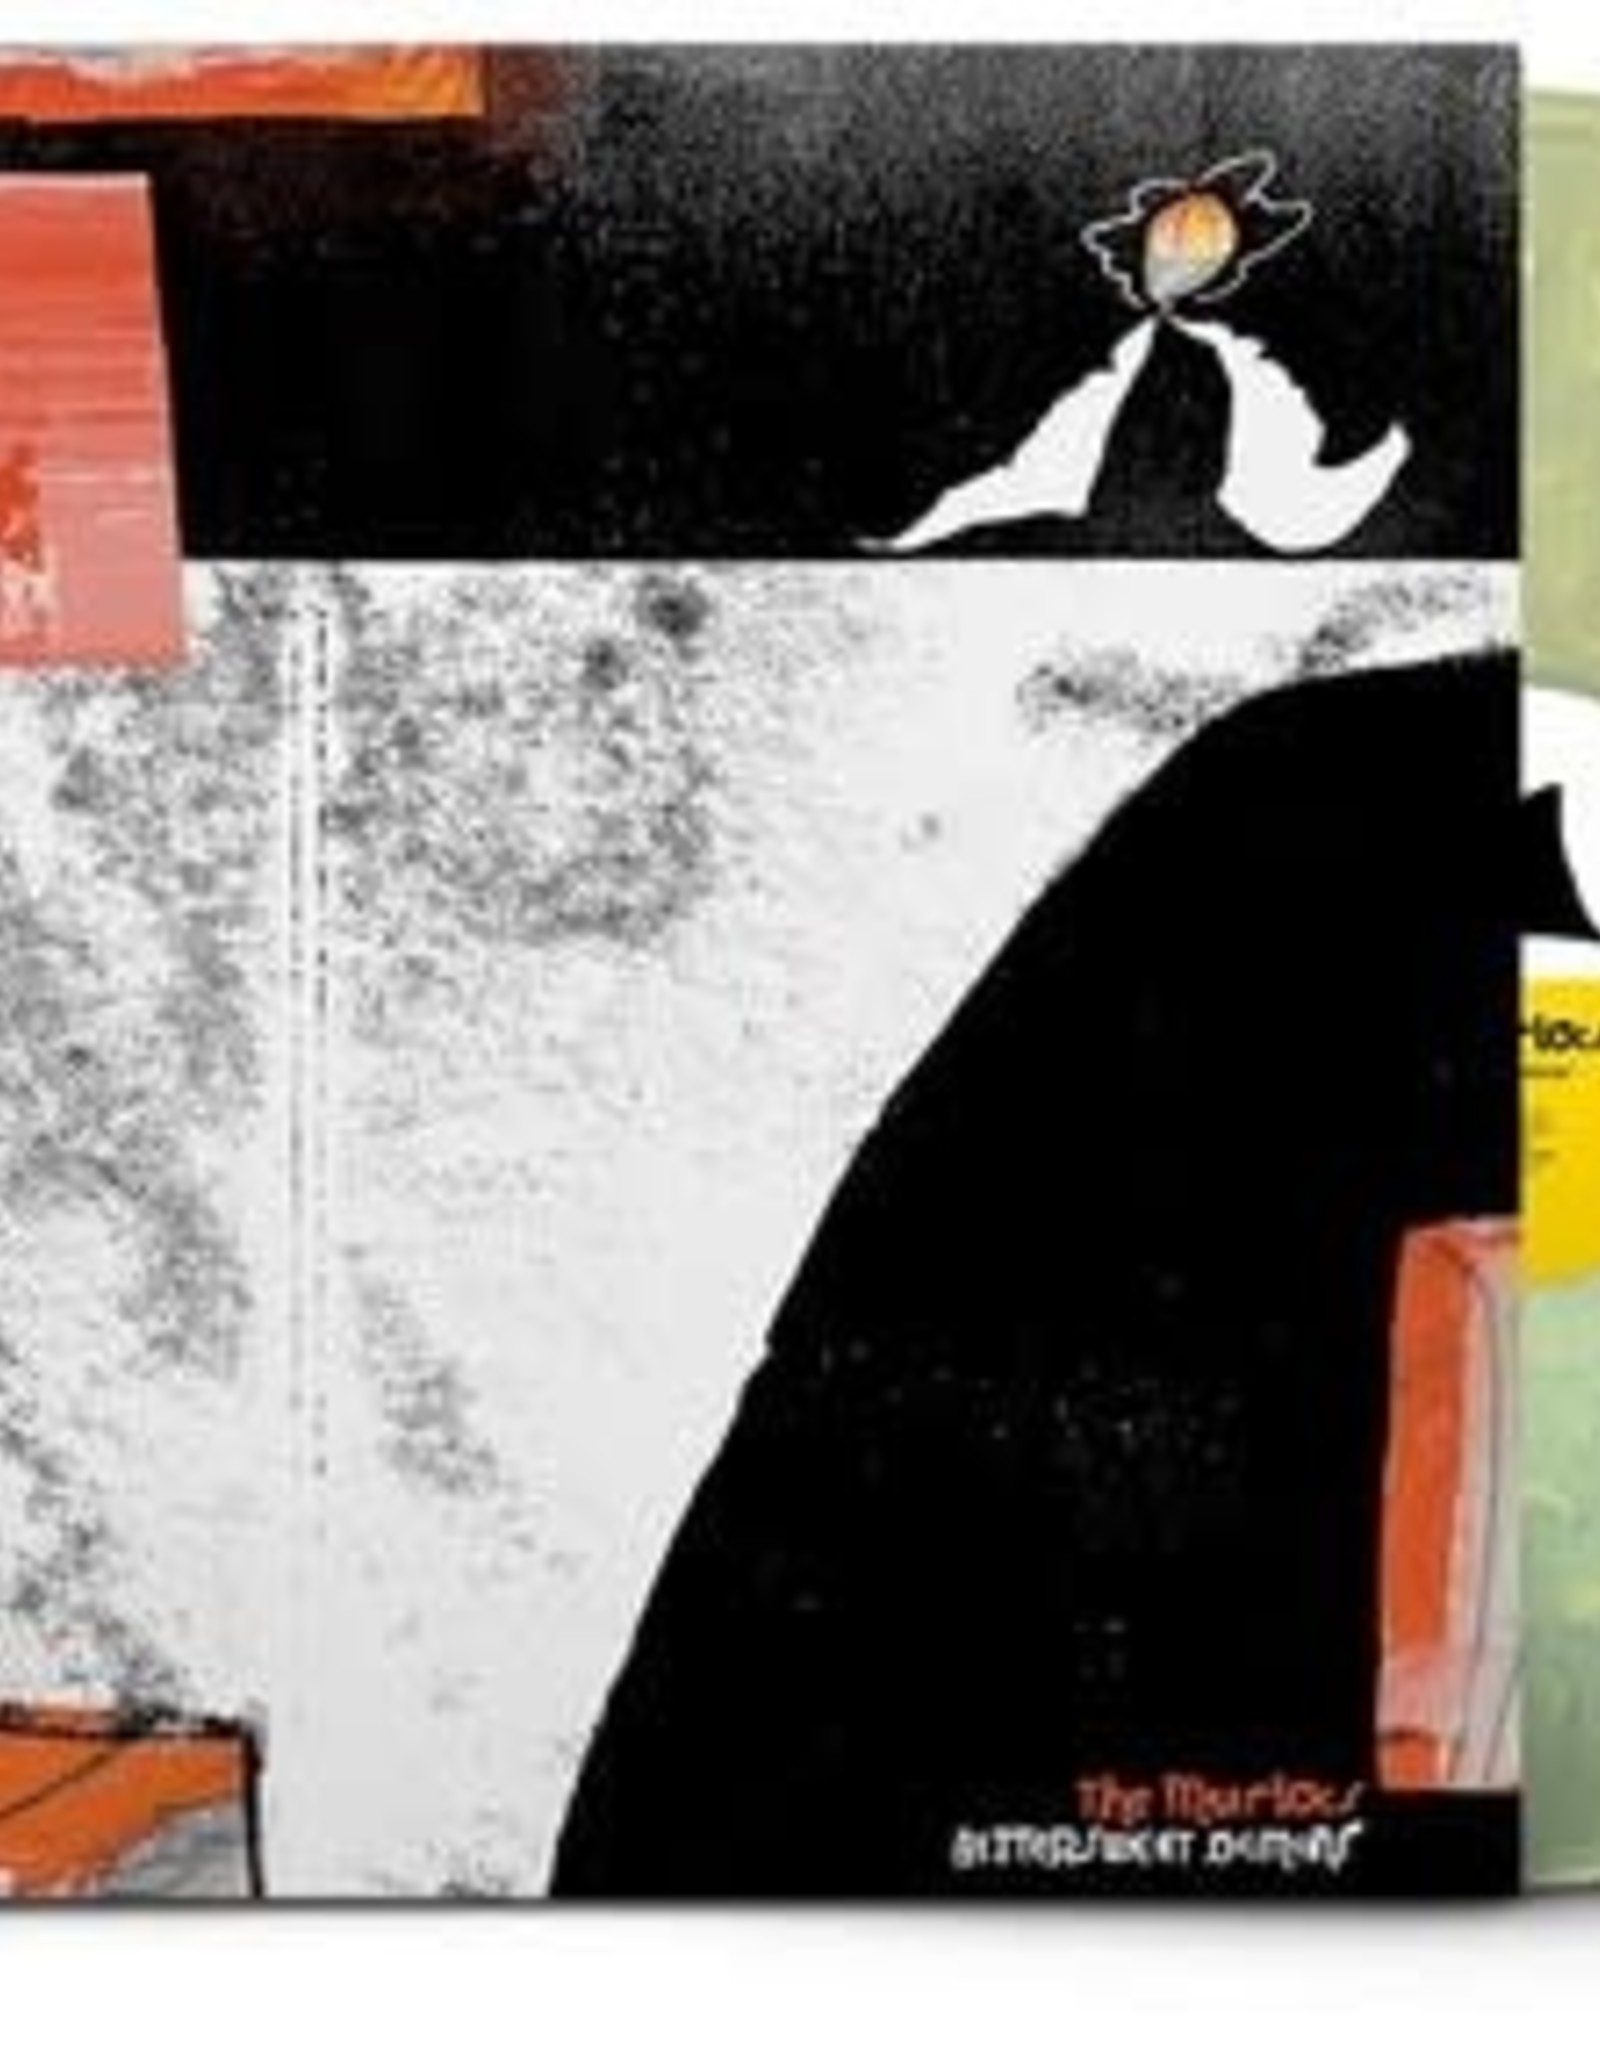 Murlocs - Bittersweet Demons (Limited Edition, Clear Vinyl,  Indie Exclusive)